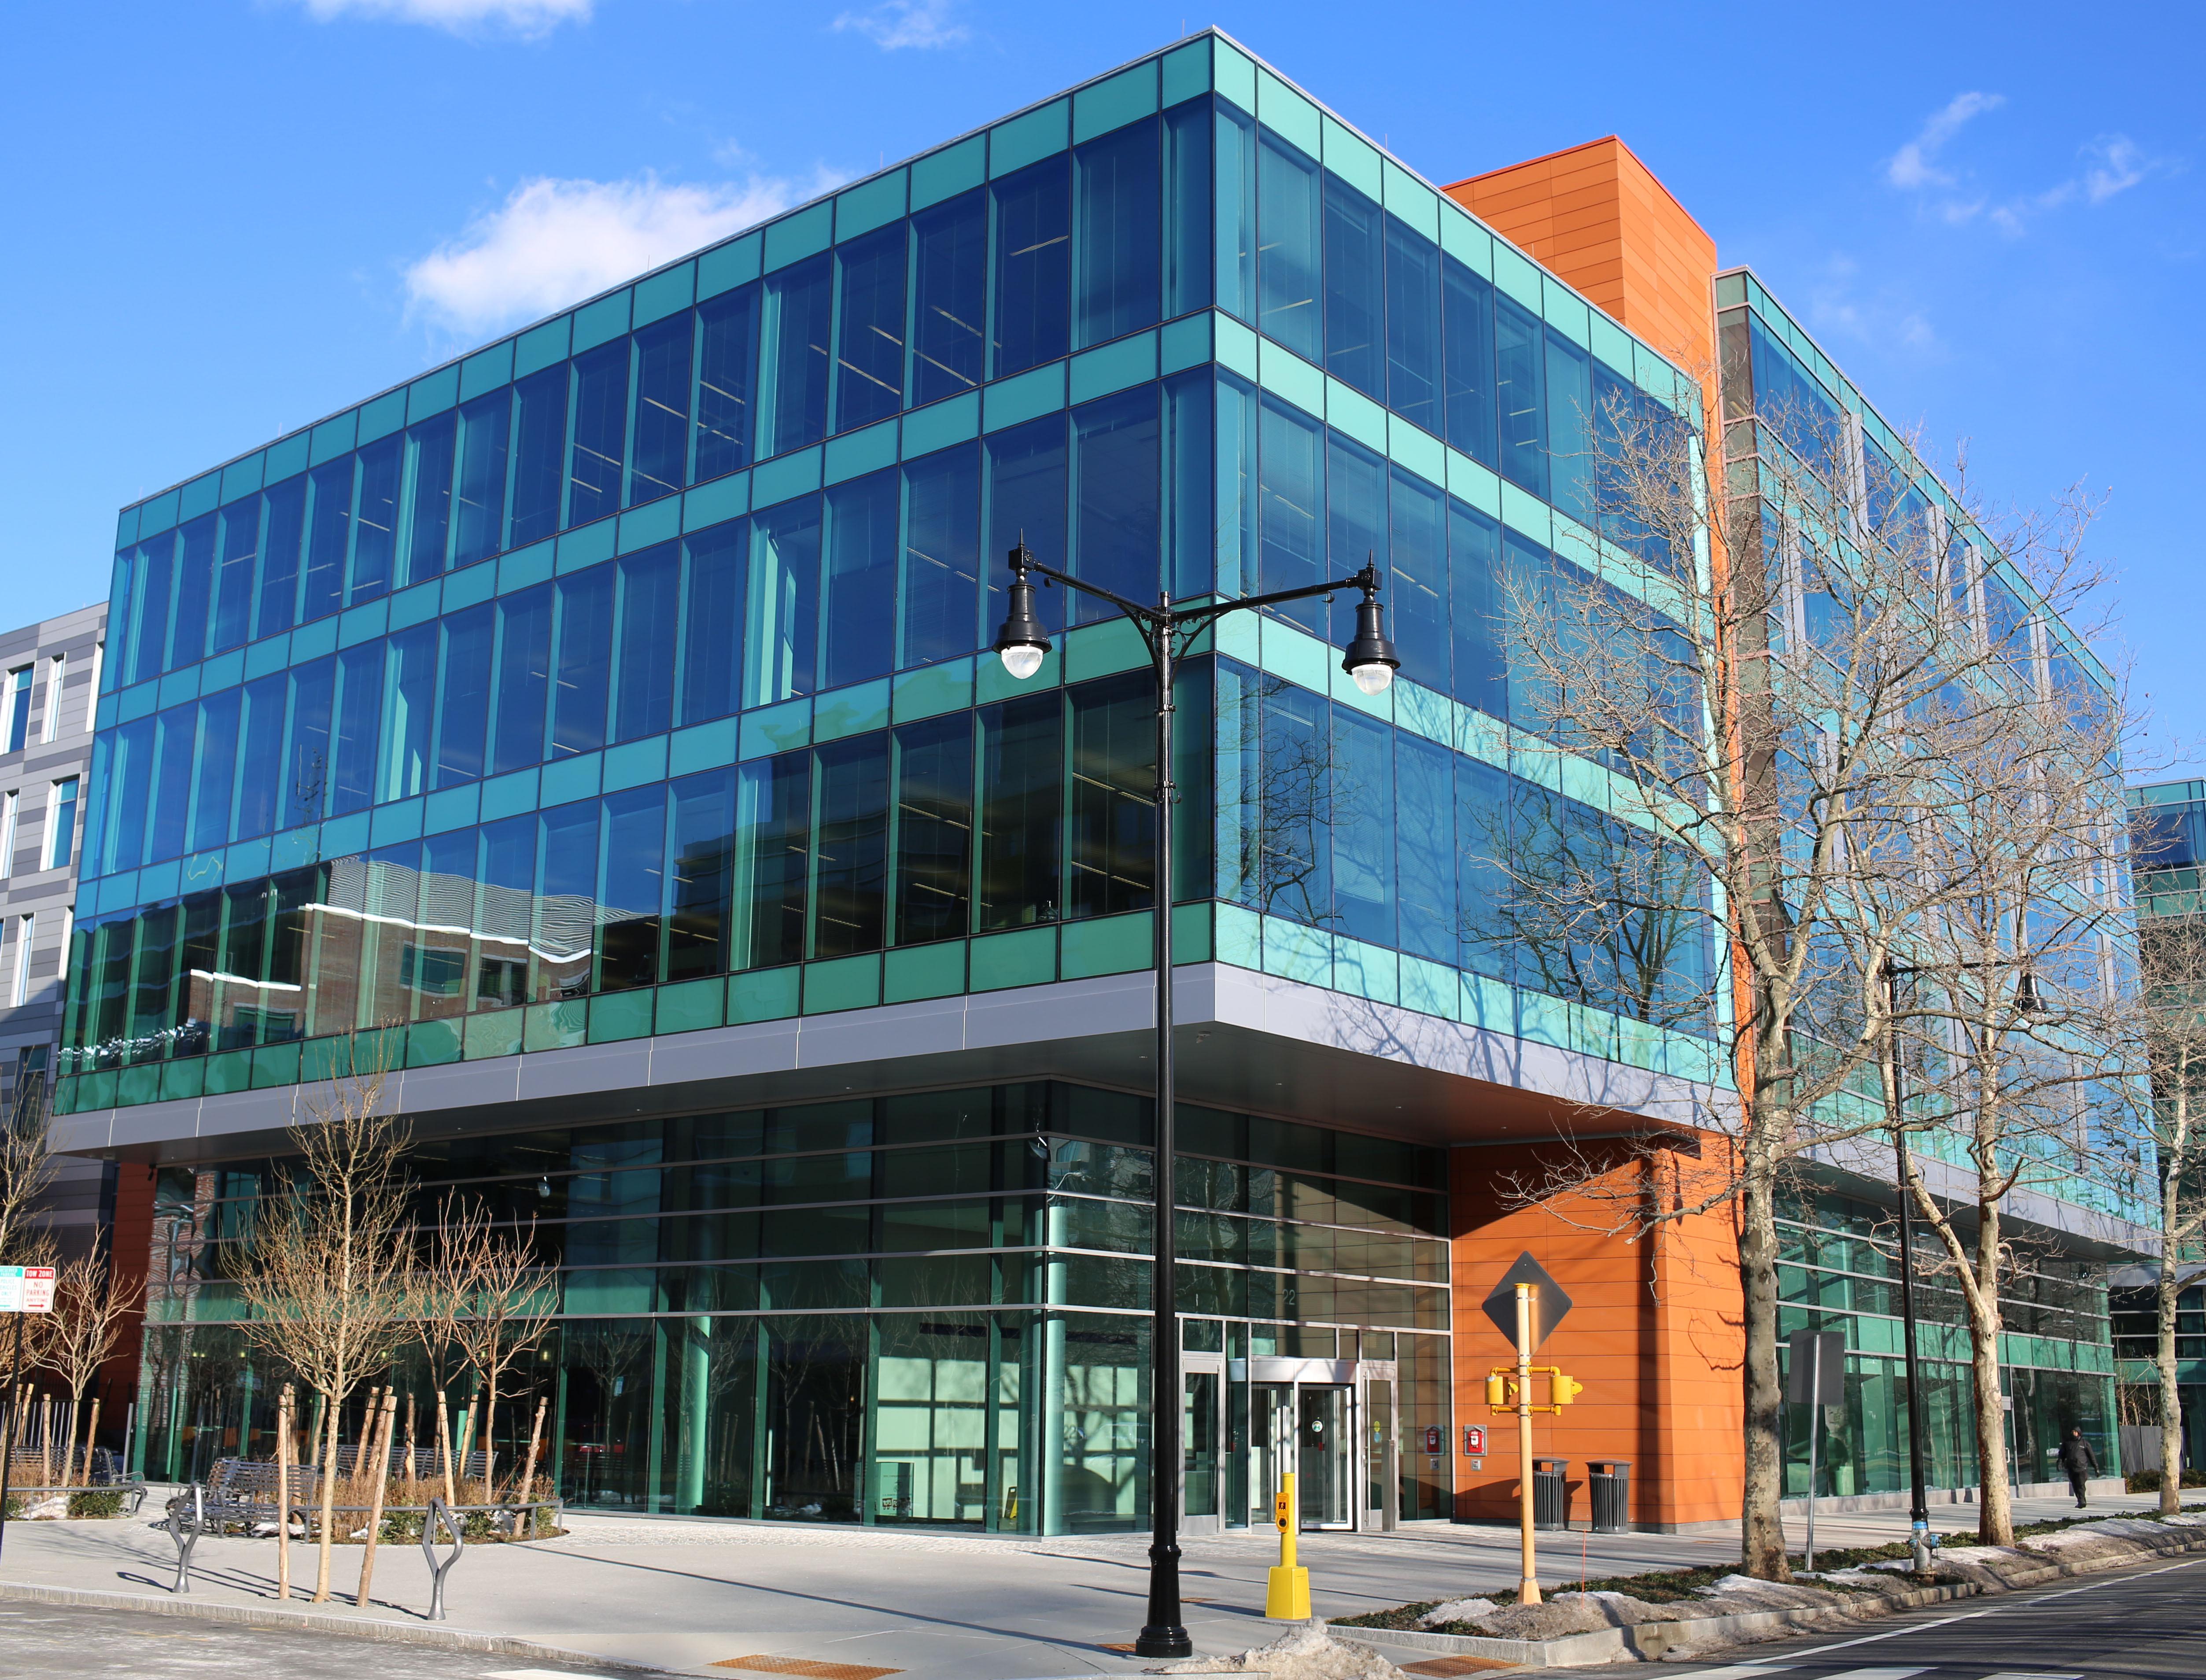 Biogen Idec's headquarters building, Cambridge, Mass. (Photo: Biogen Idec)